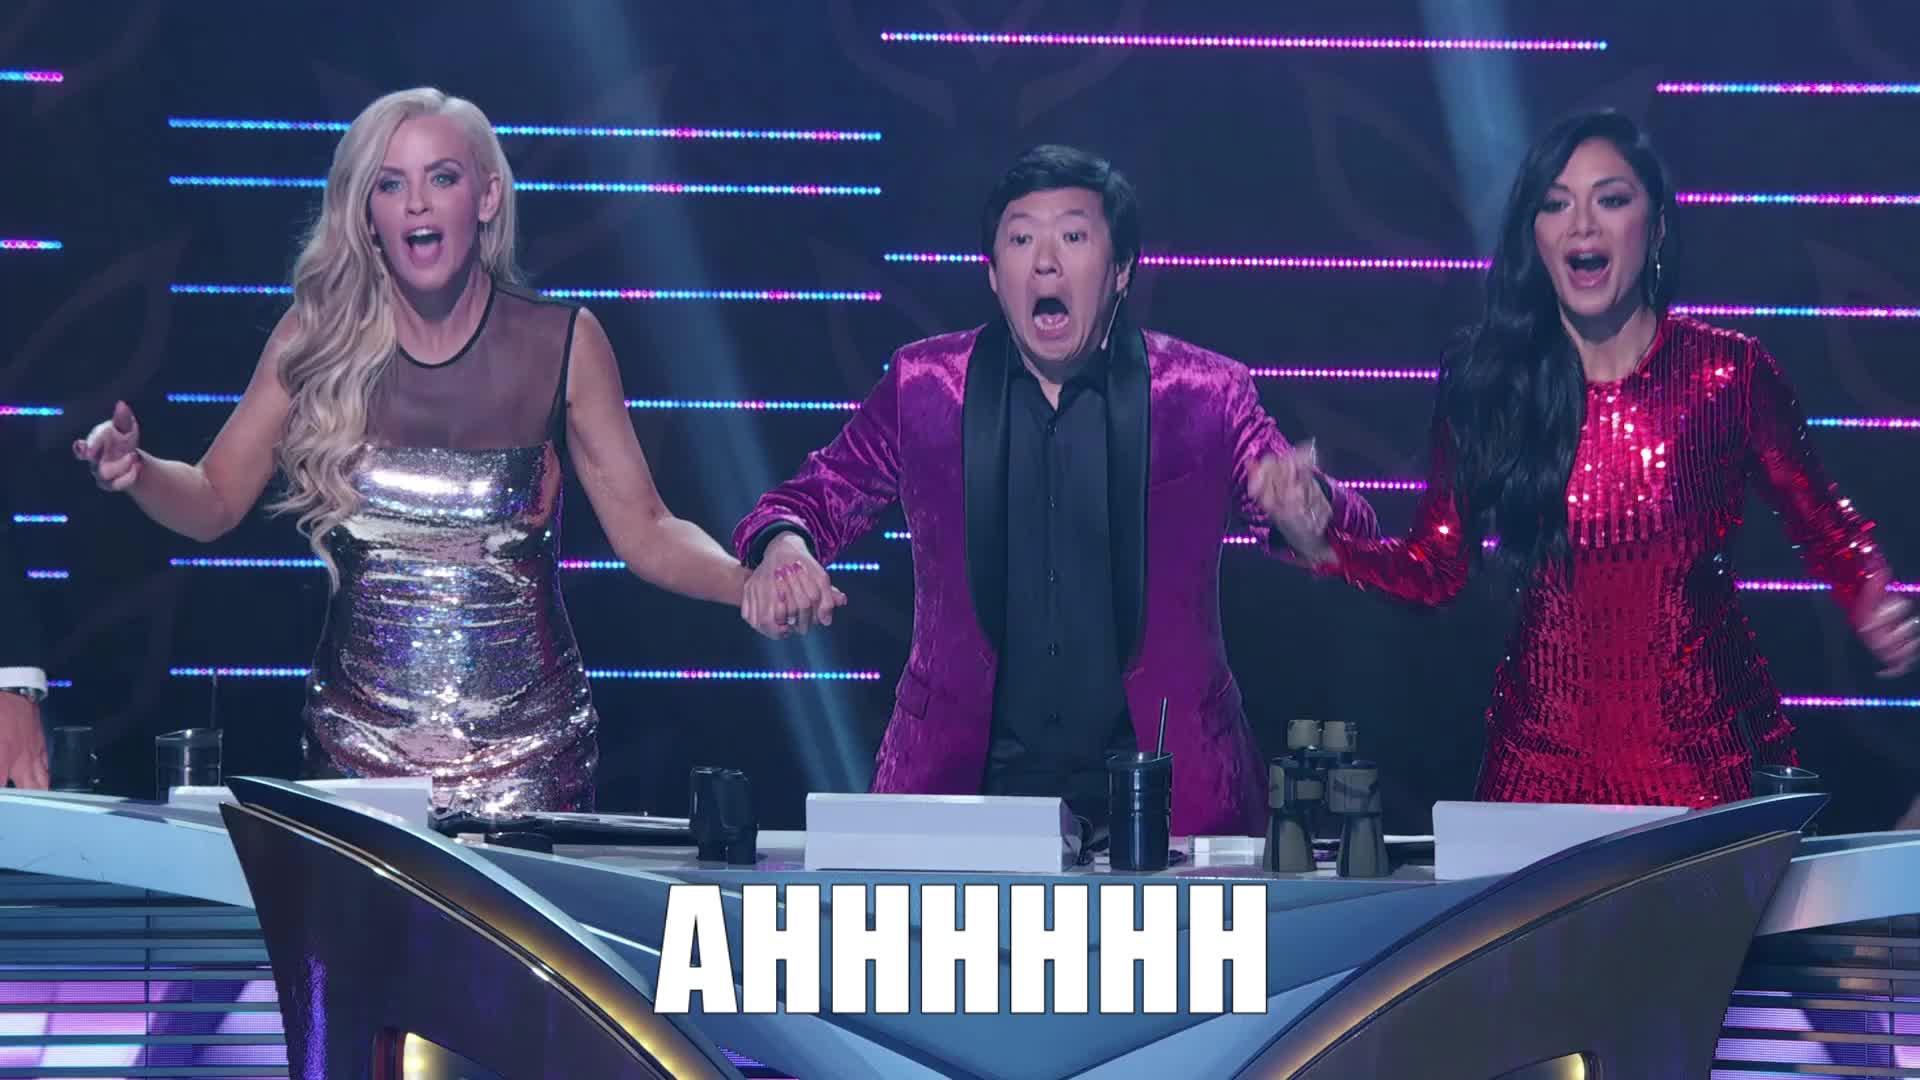 ahhh, excited, jenny mccarthy, ken jeong, masked singer, nicole scherzinger, omg, scream, screaming, shocked, surprise, the masked singer, the masked singer on fox, Jenny, Ken, and Nicole Ahhhh GIFs